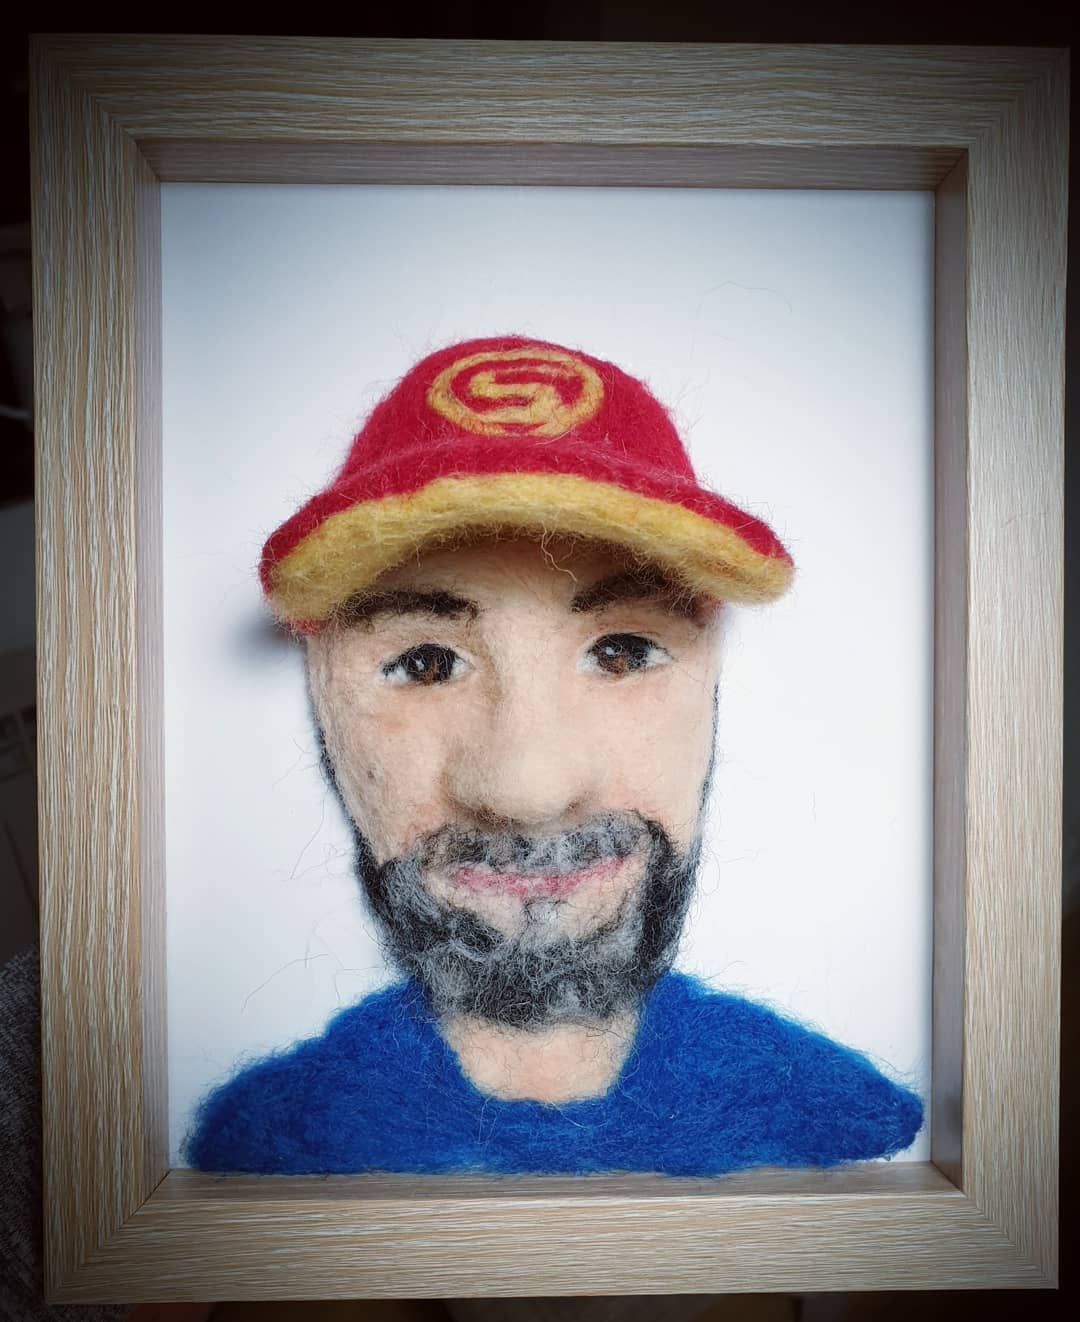 Needlefelt portrait ☺️ #needlefelt #needlefelting #needle #felt #portrait #gift #handmade #doll #artdoll #dollmaker #artdoll #art #artistic #artist #photo #photography #hobby #passion #boy #man #felting #feltingwool #craft #crafts #crafting #dollsneedlefelt Needlefelt portrait ☺️ #needlefelt #needlefelting #needle #felt #portrait #gift #handmade #doll #artdoll #dollmaker #artdoll #art #artistic #artist #photo #photography #hobby #passion #boy #man #felting #feltingwool #craft #crafts #cr #dollsneedlefelt